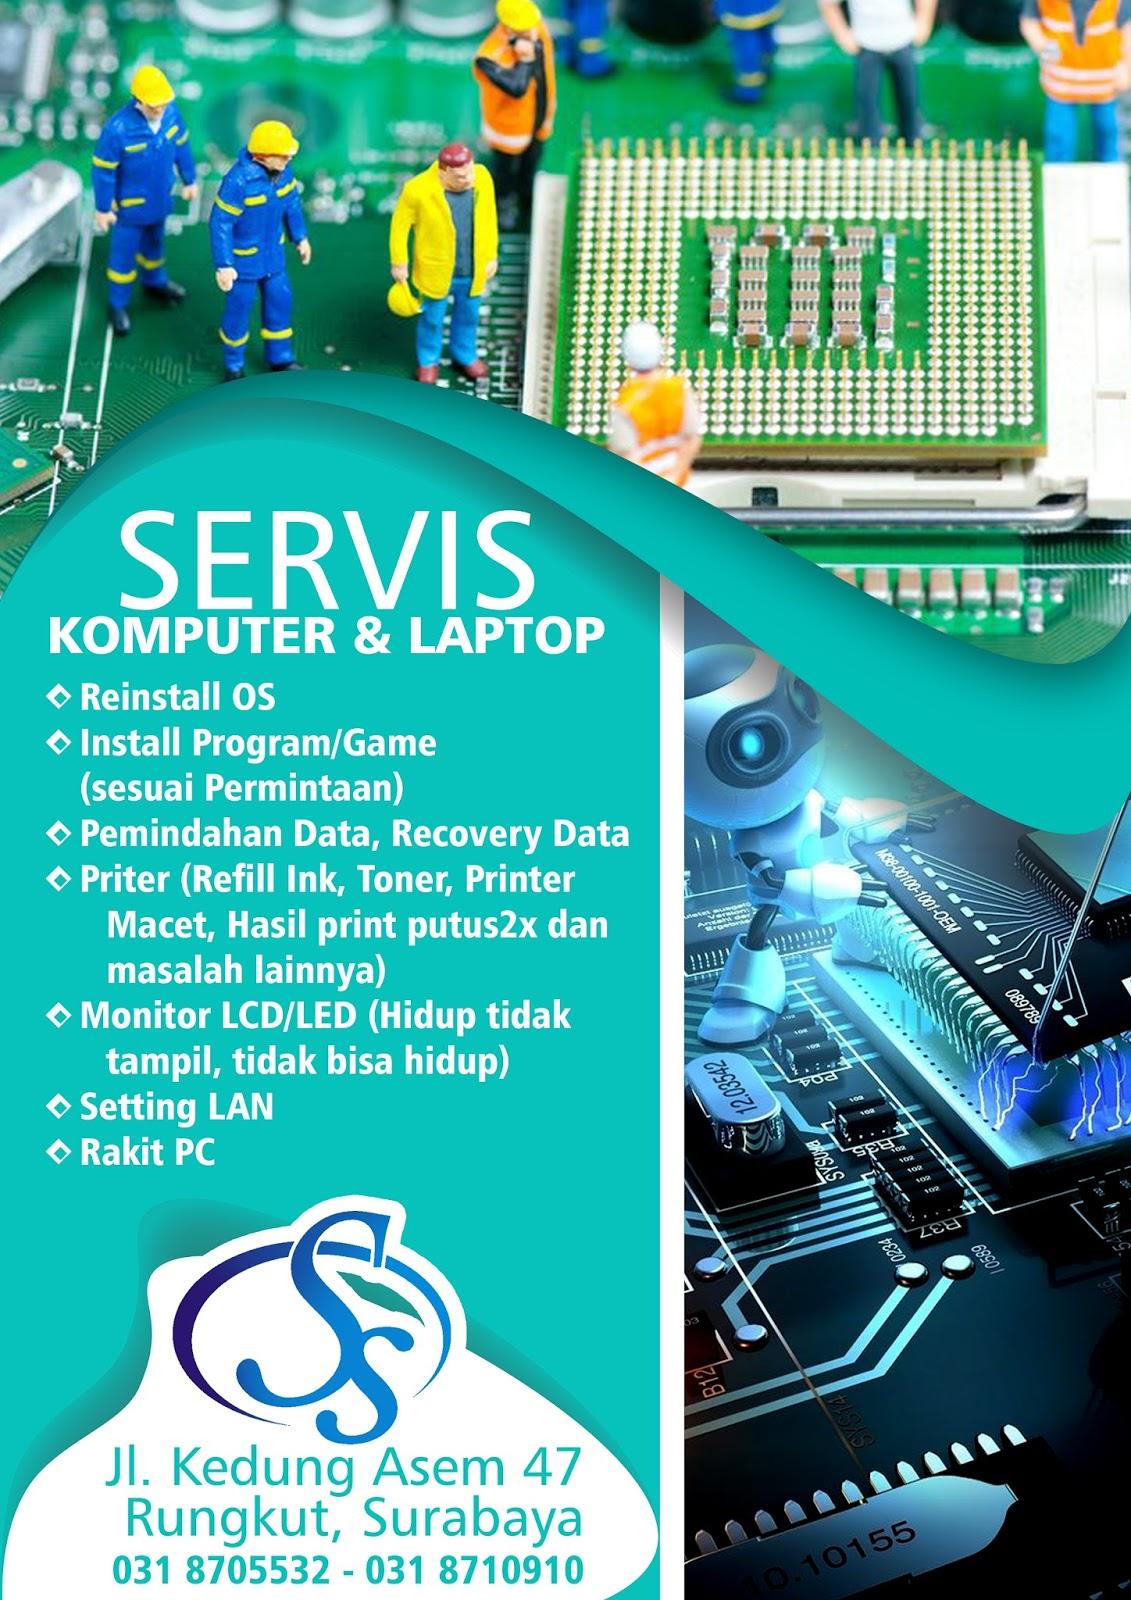 servis laptop jujur terpercaya   servis laptop surabaya